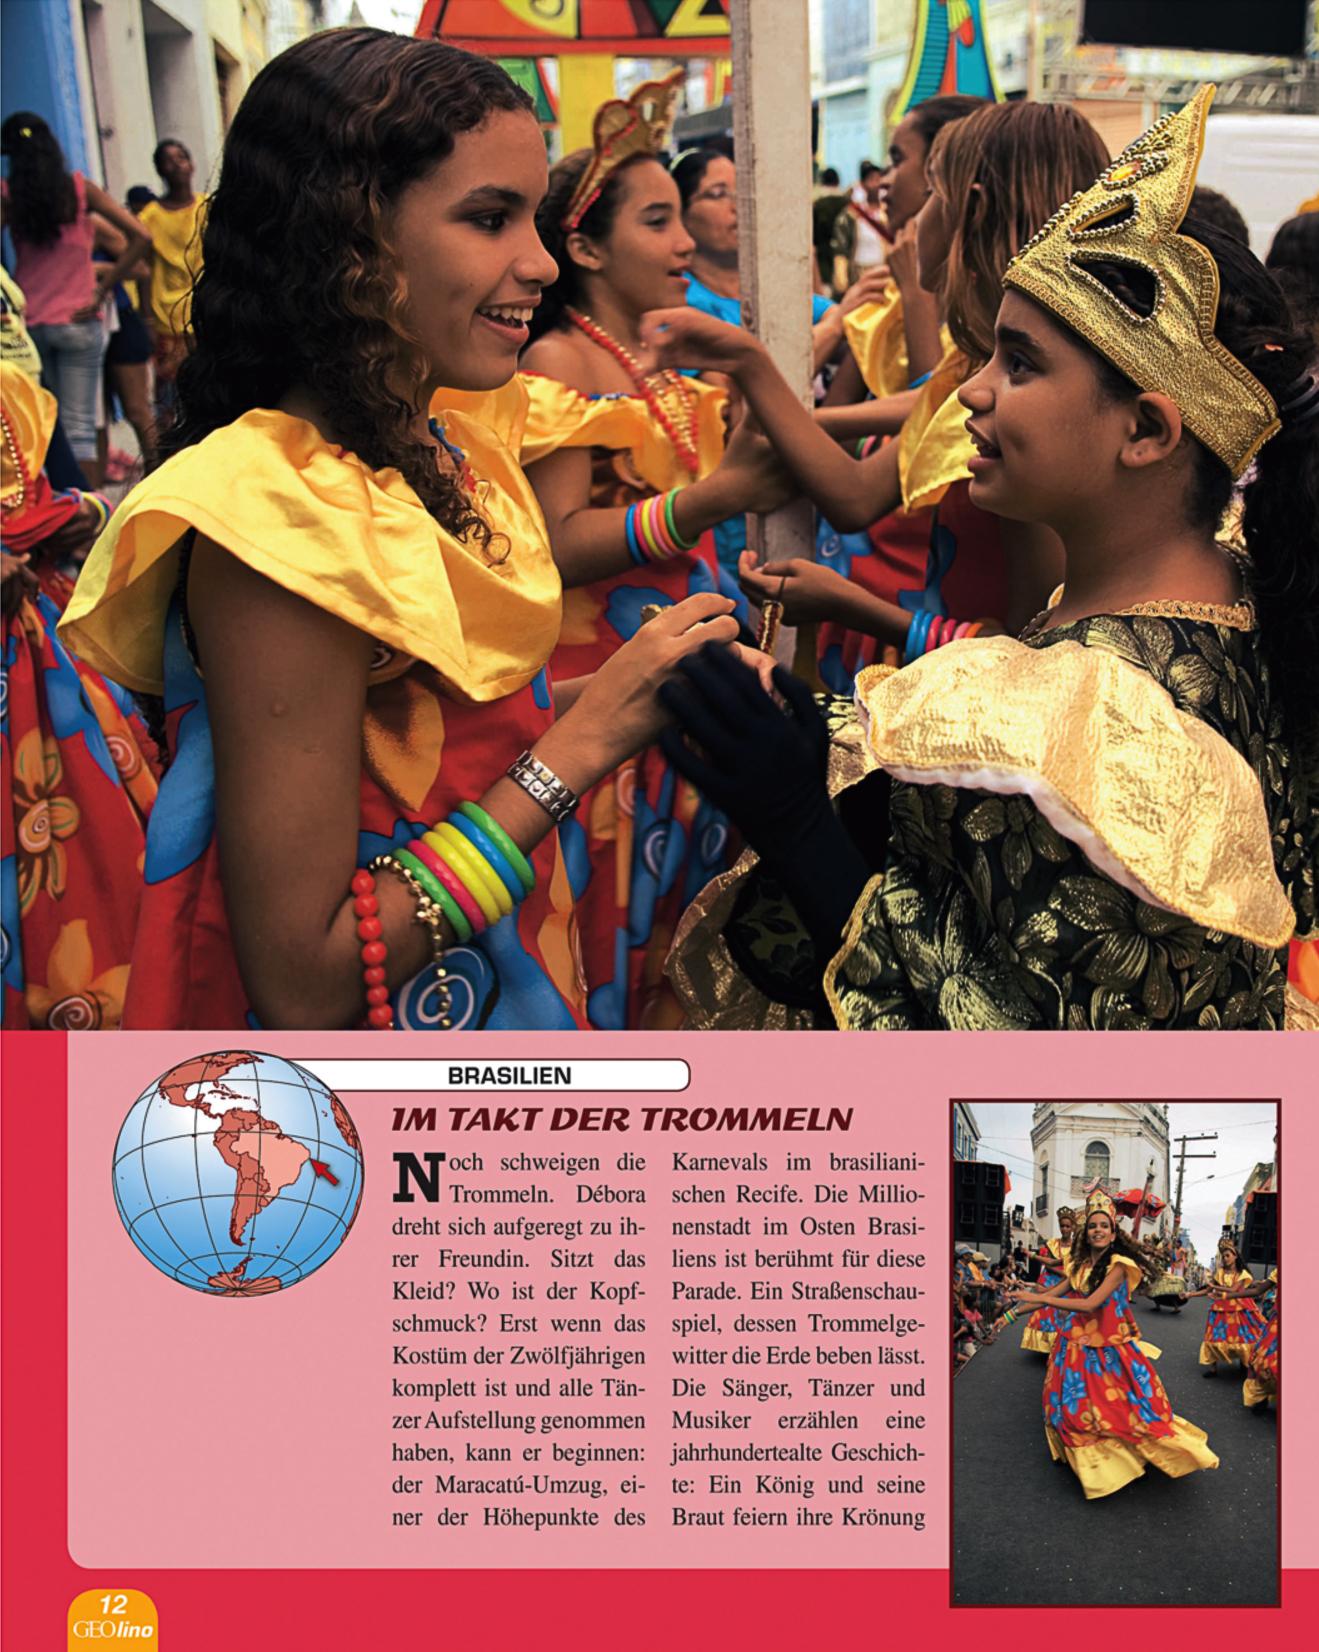 Imagines from Carnaval in Recife in German children's magazine  GEO Lino.